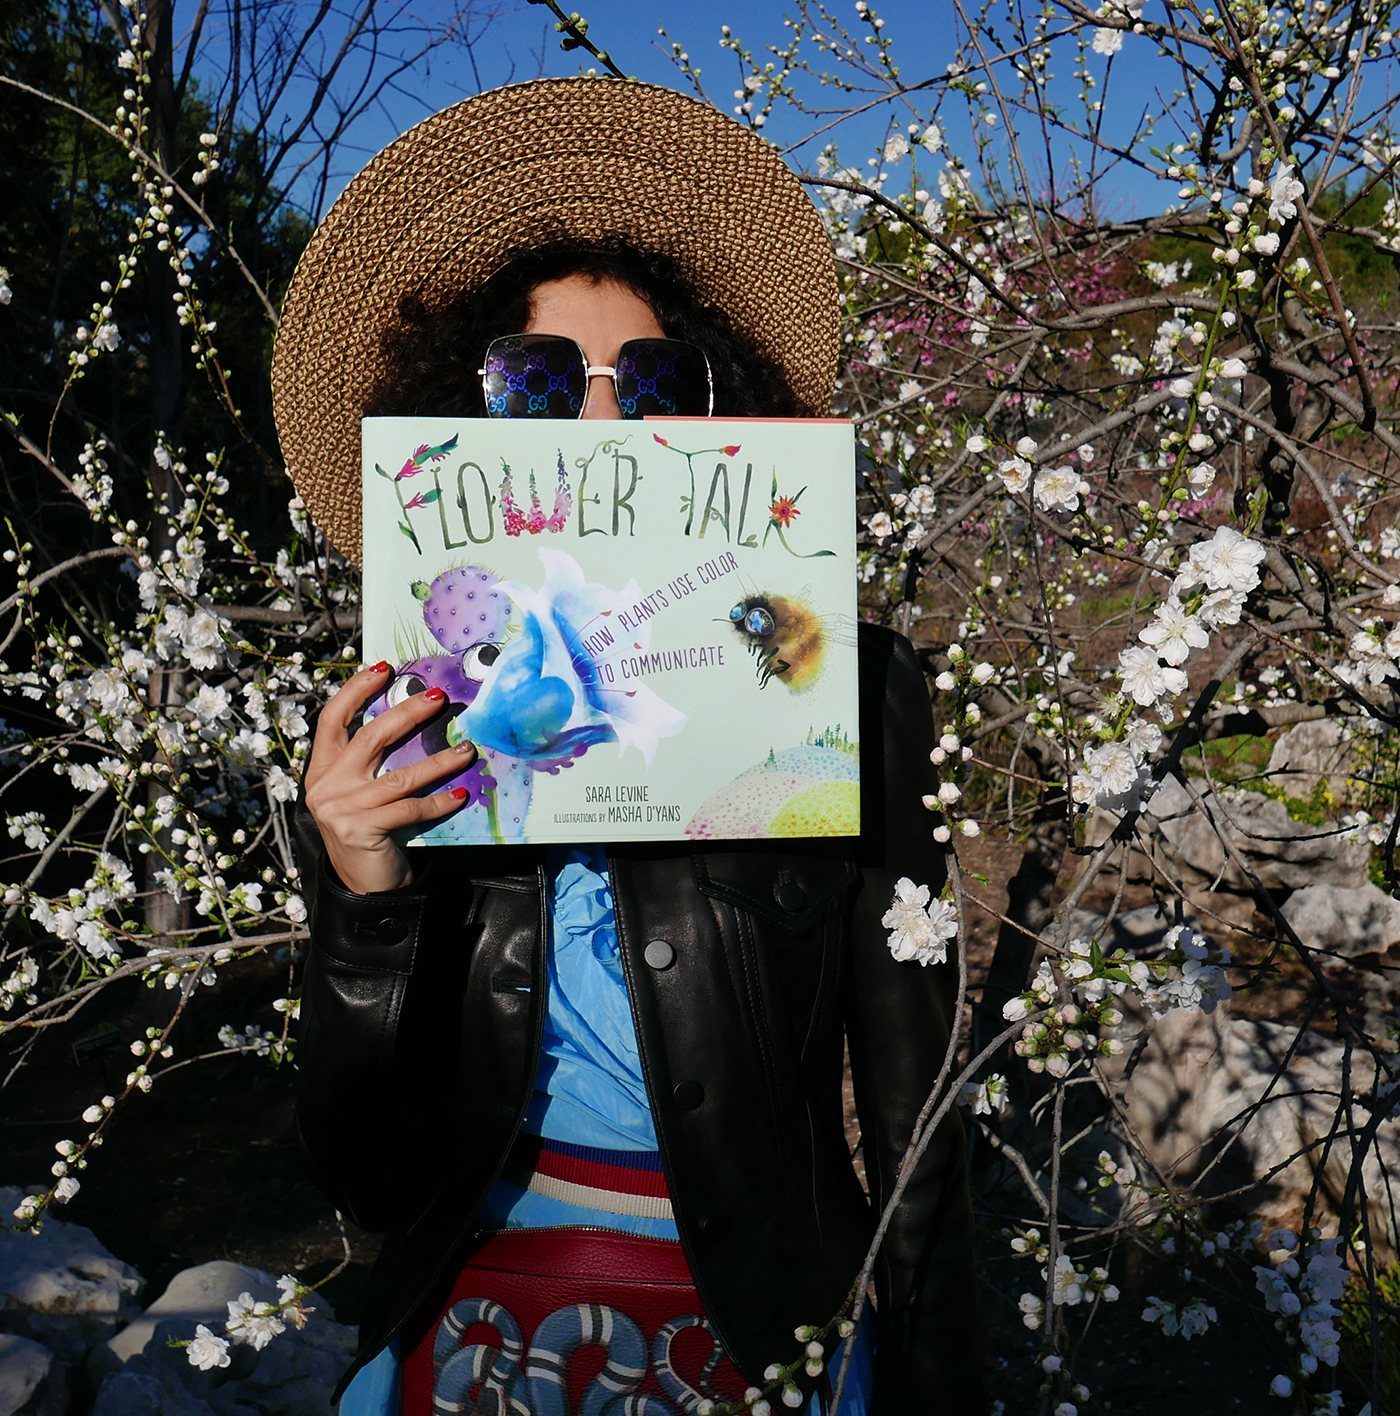 Flower Talk book by Masha D'yans reading in sakura